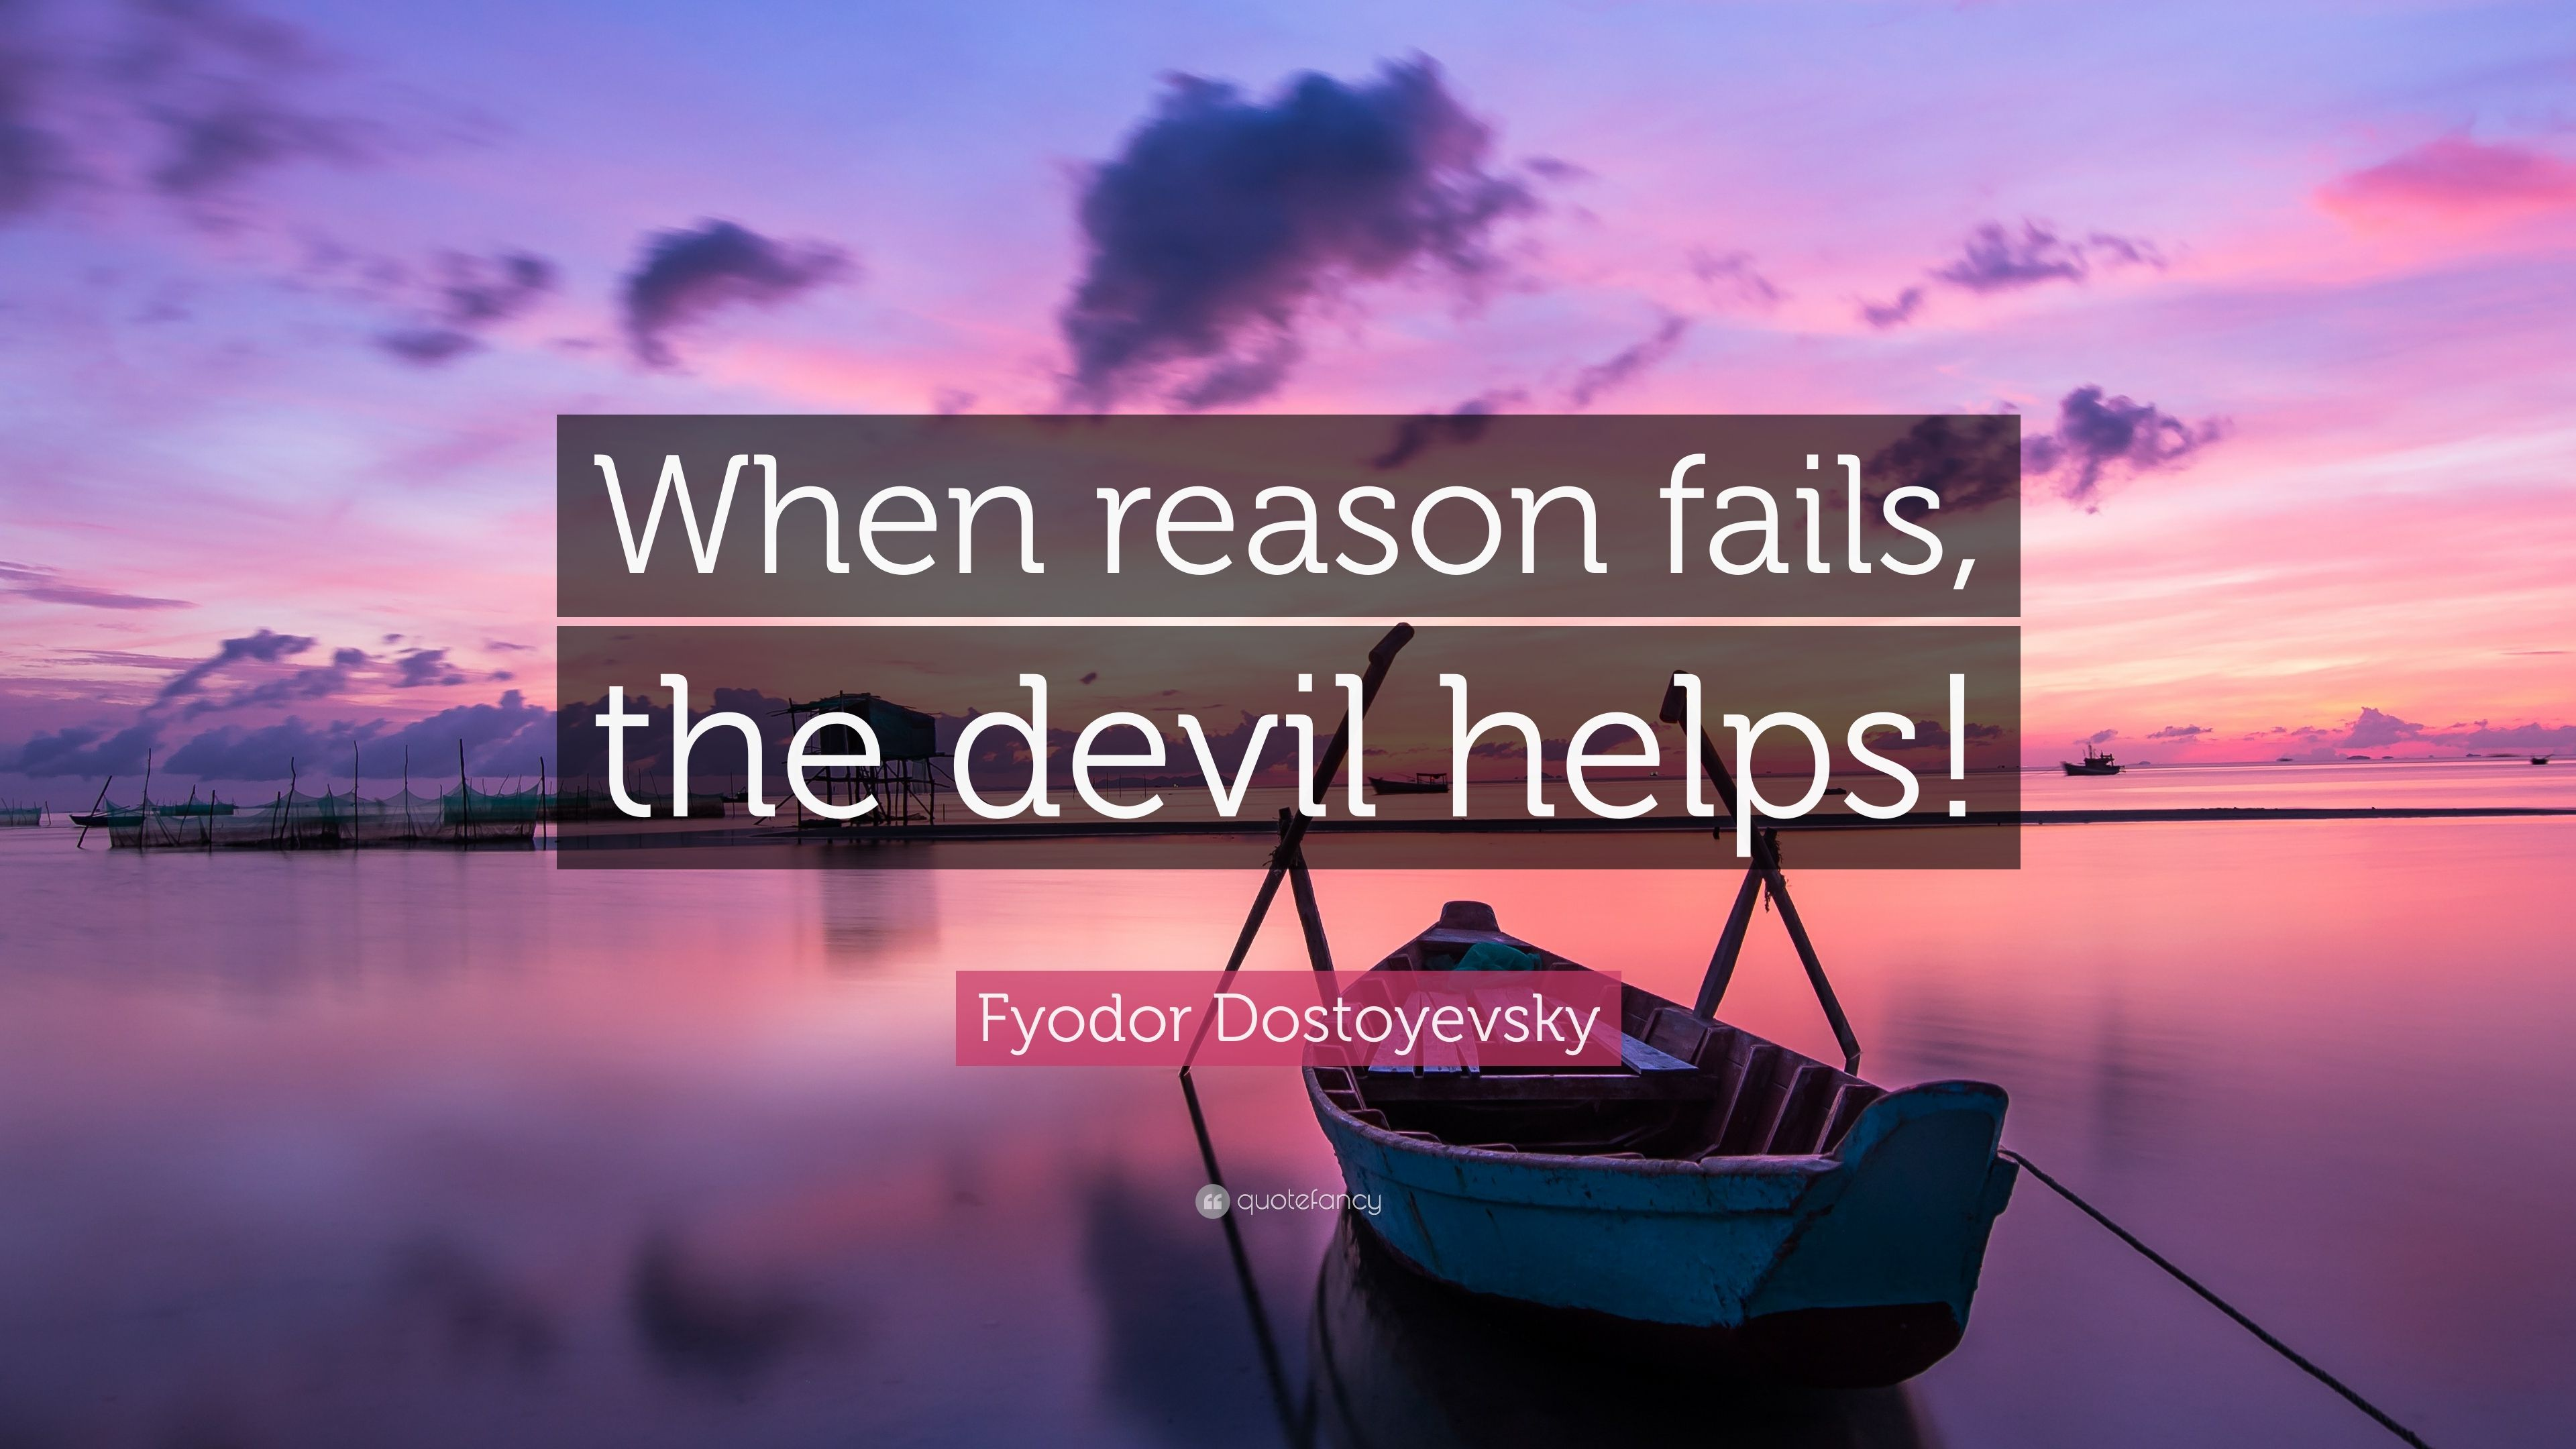 when reason fails the devil helps